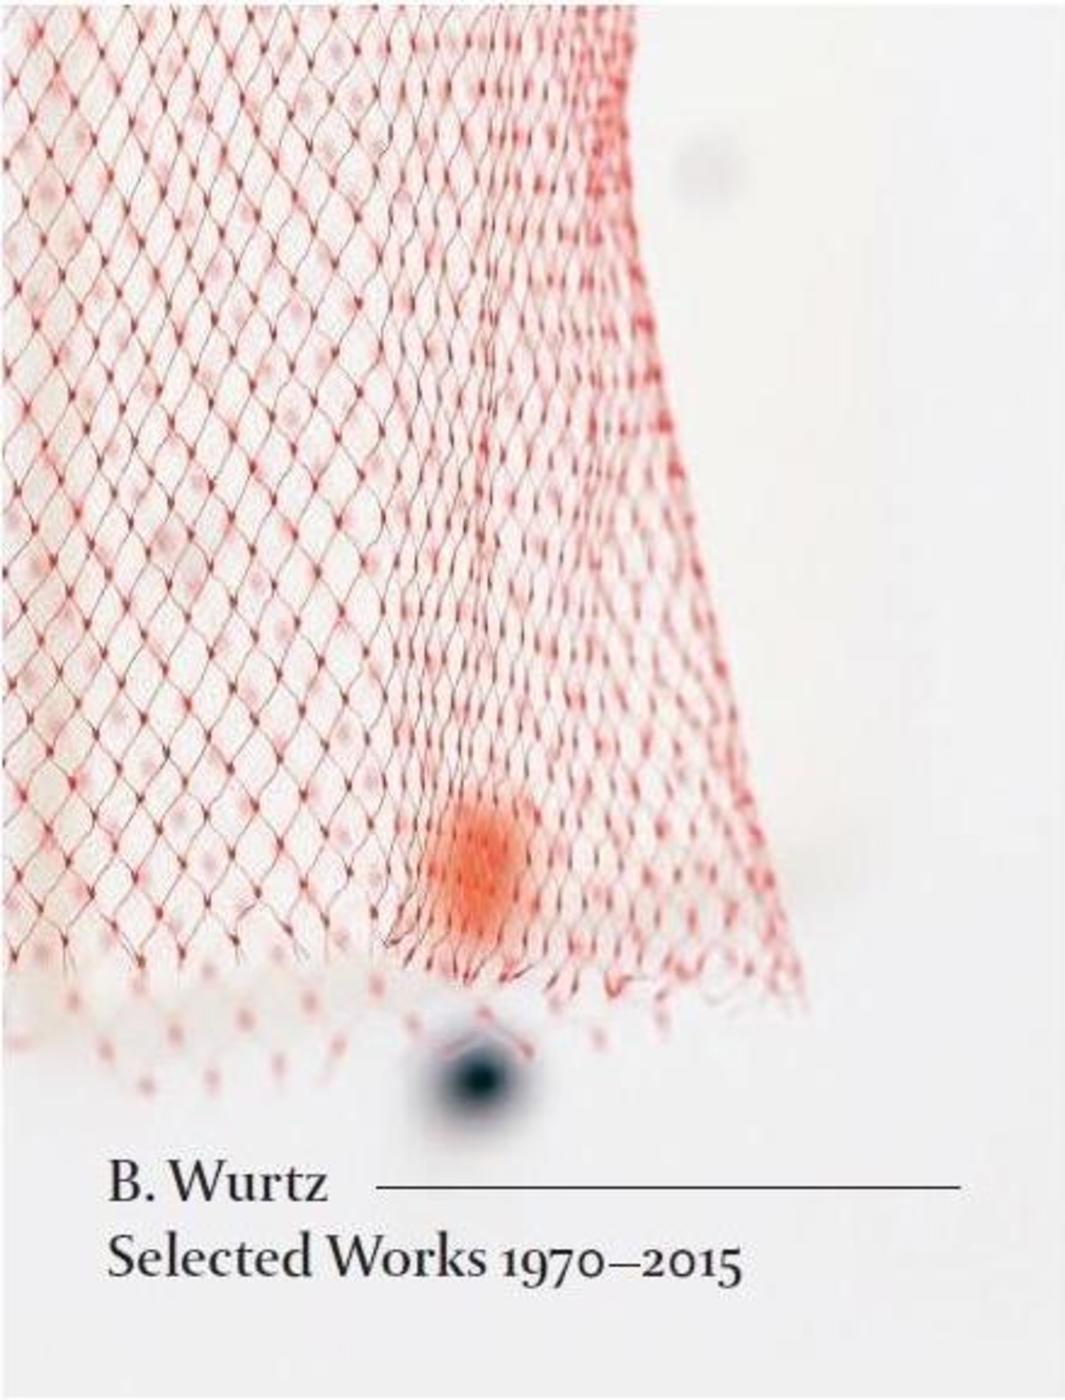 B wurtz catalogue